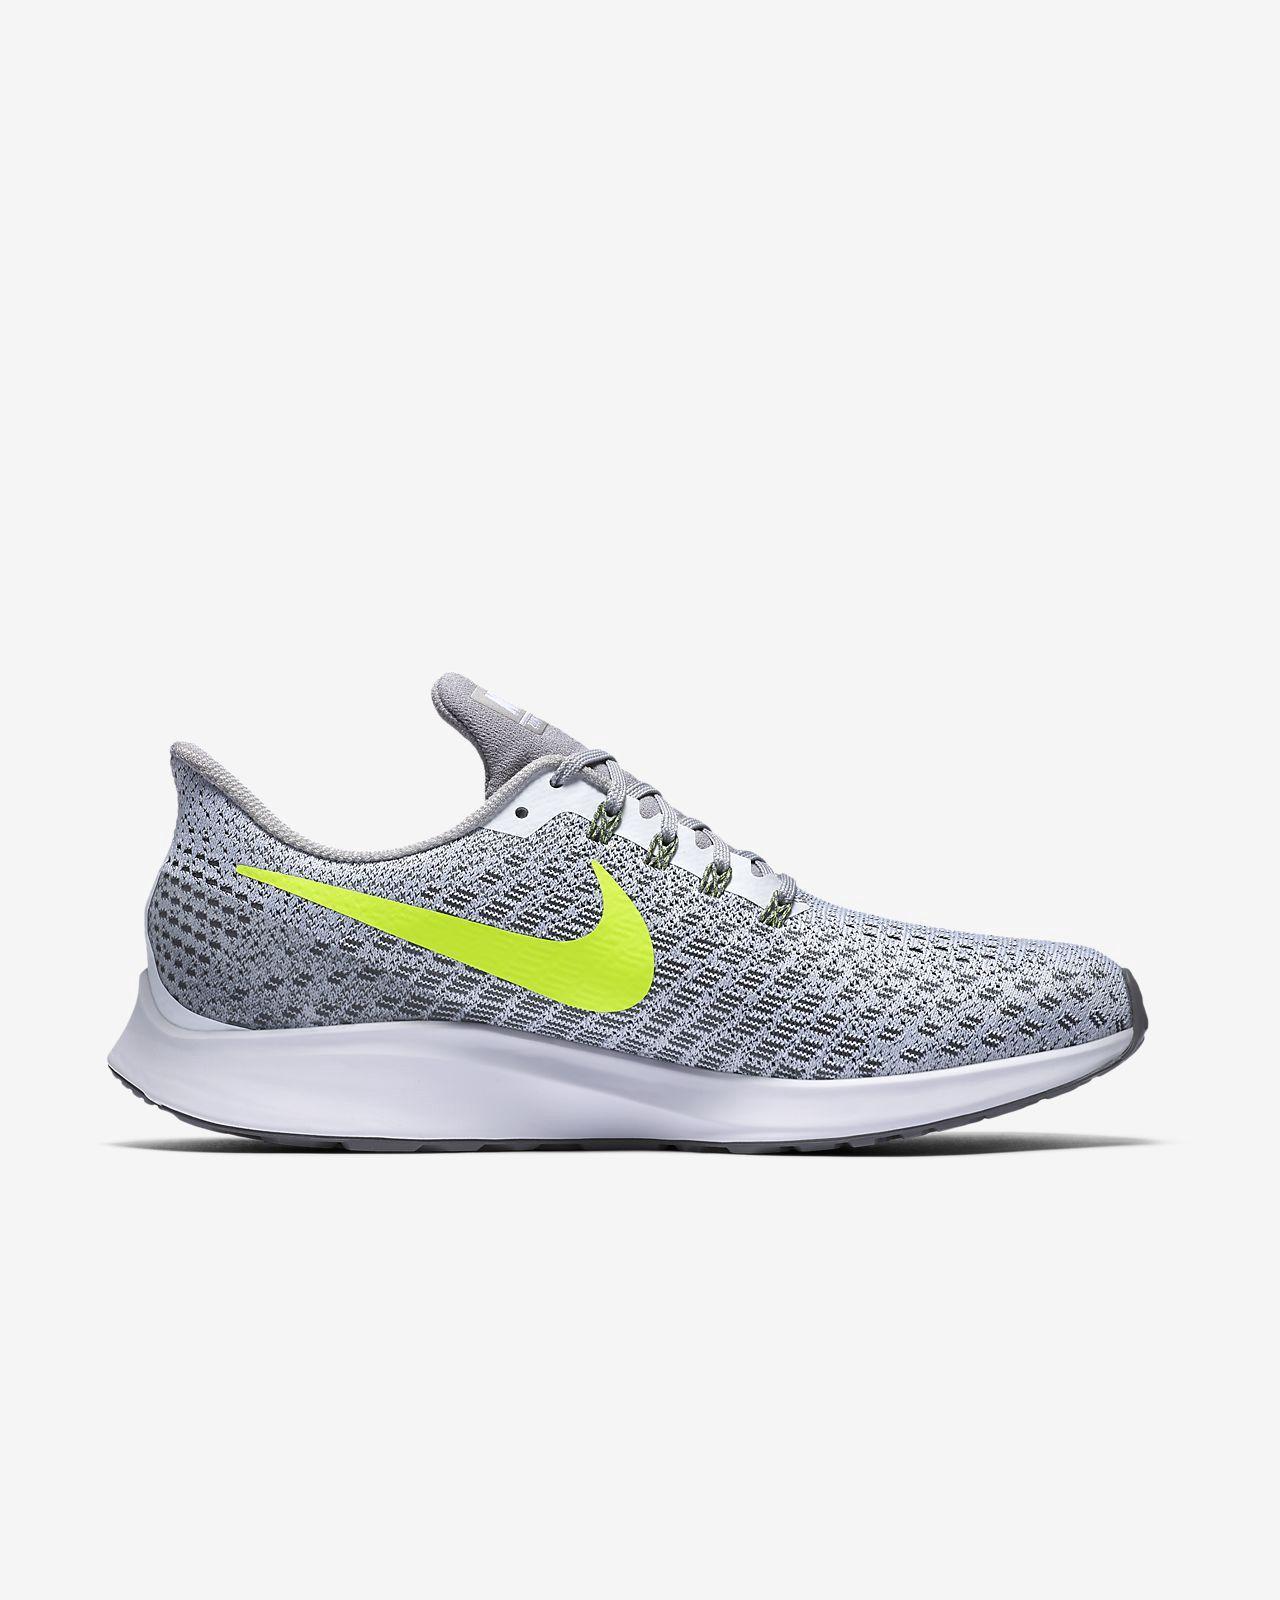 men, Nike air zoom pegasus, Running shoes